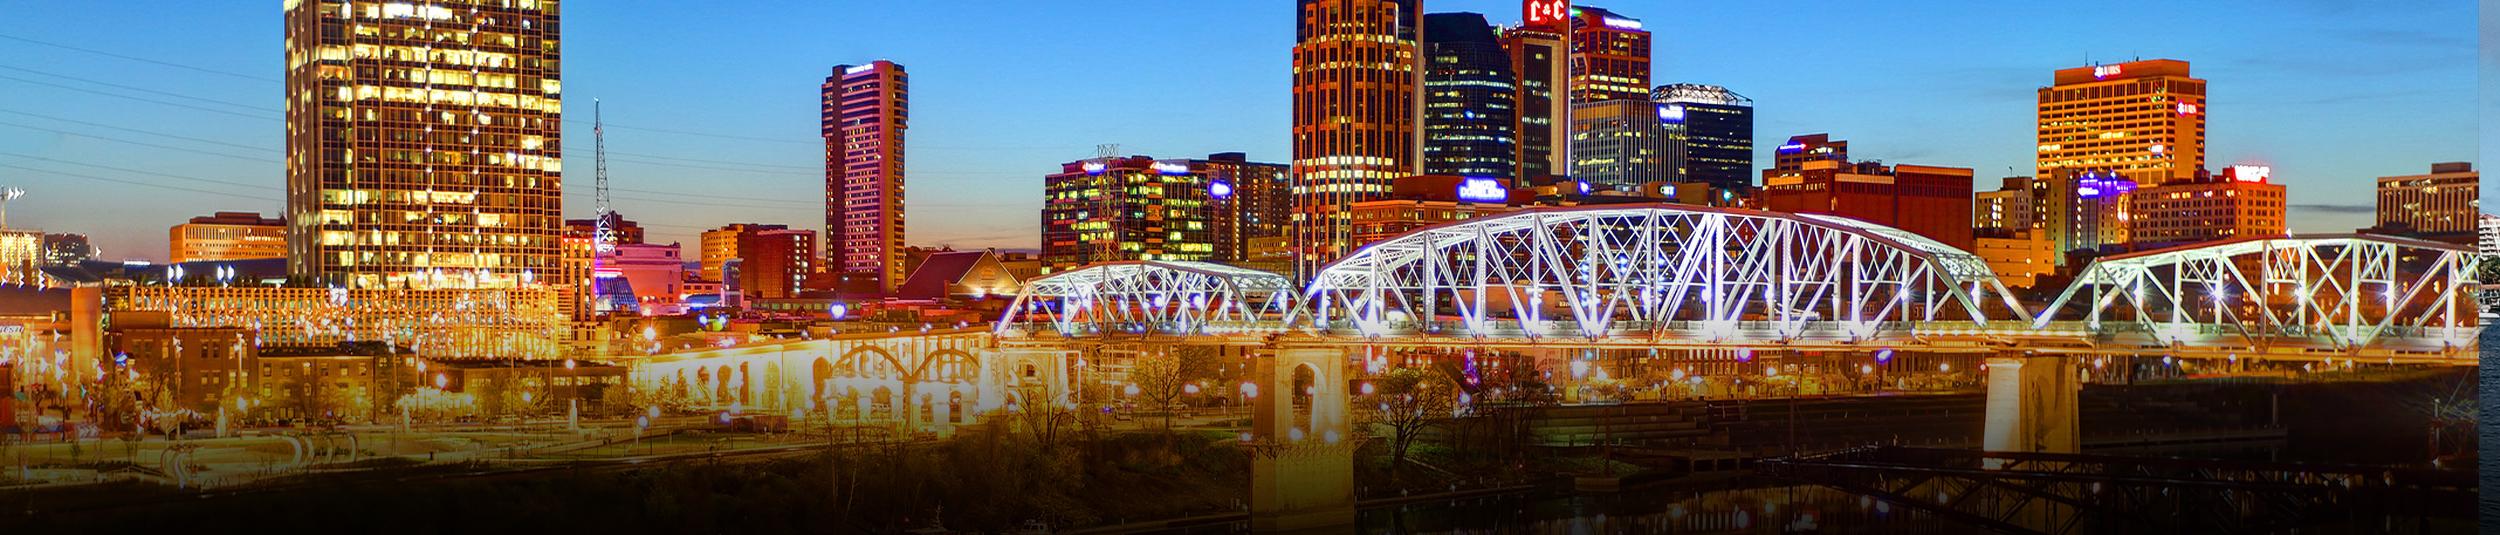 Streets of Nashville